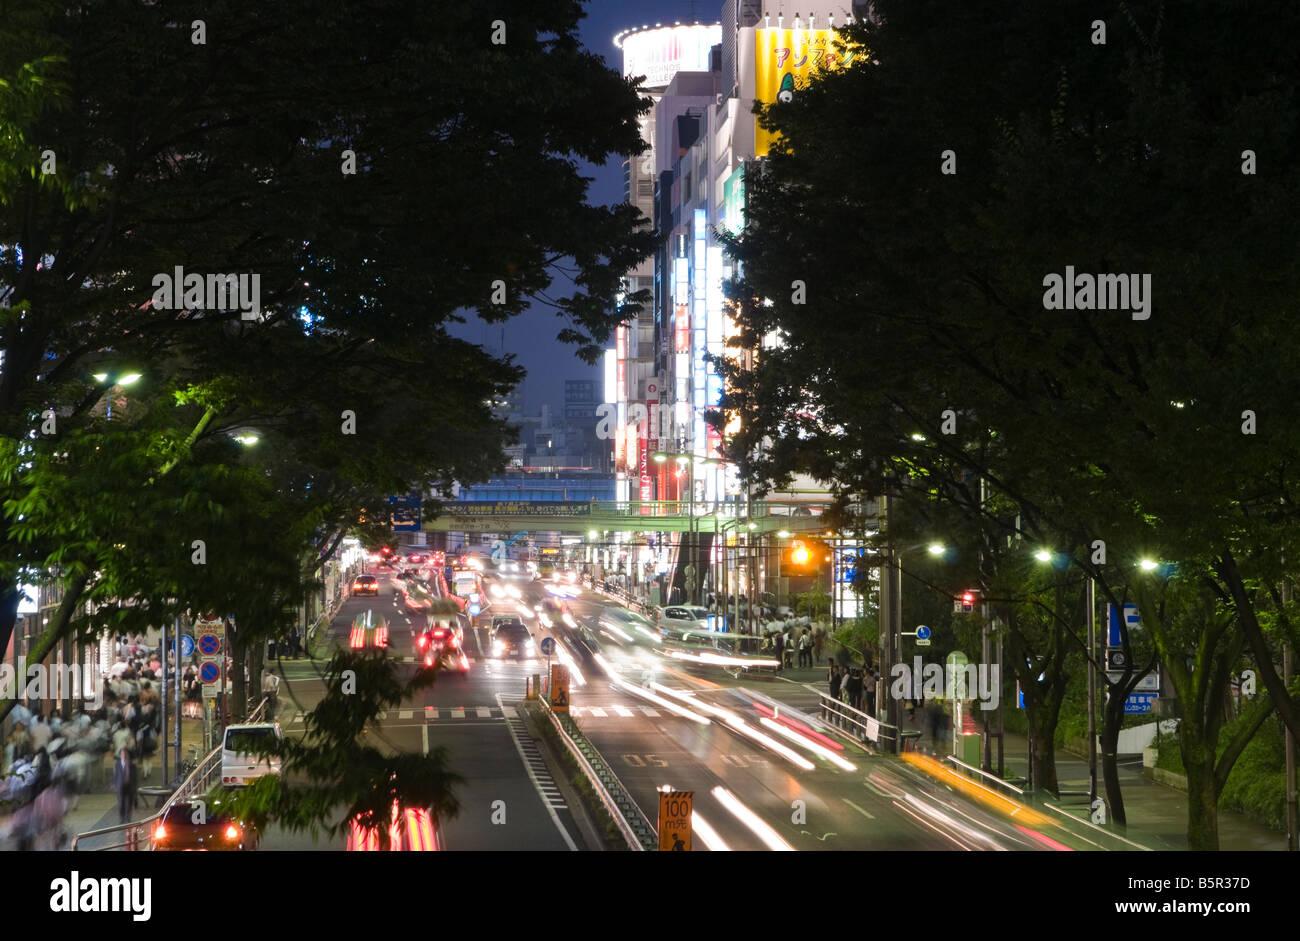 Busy Street in Shibuya, Tokyo - Stock Image